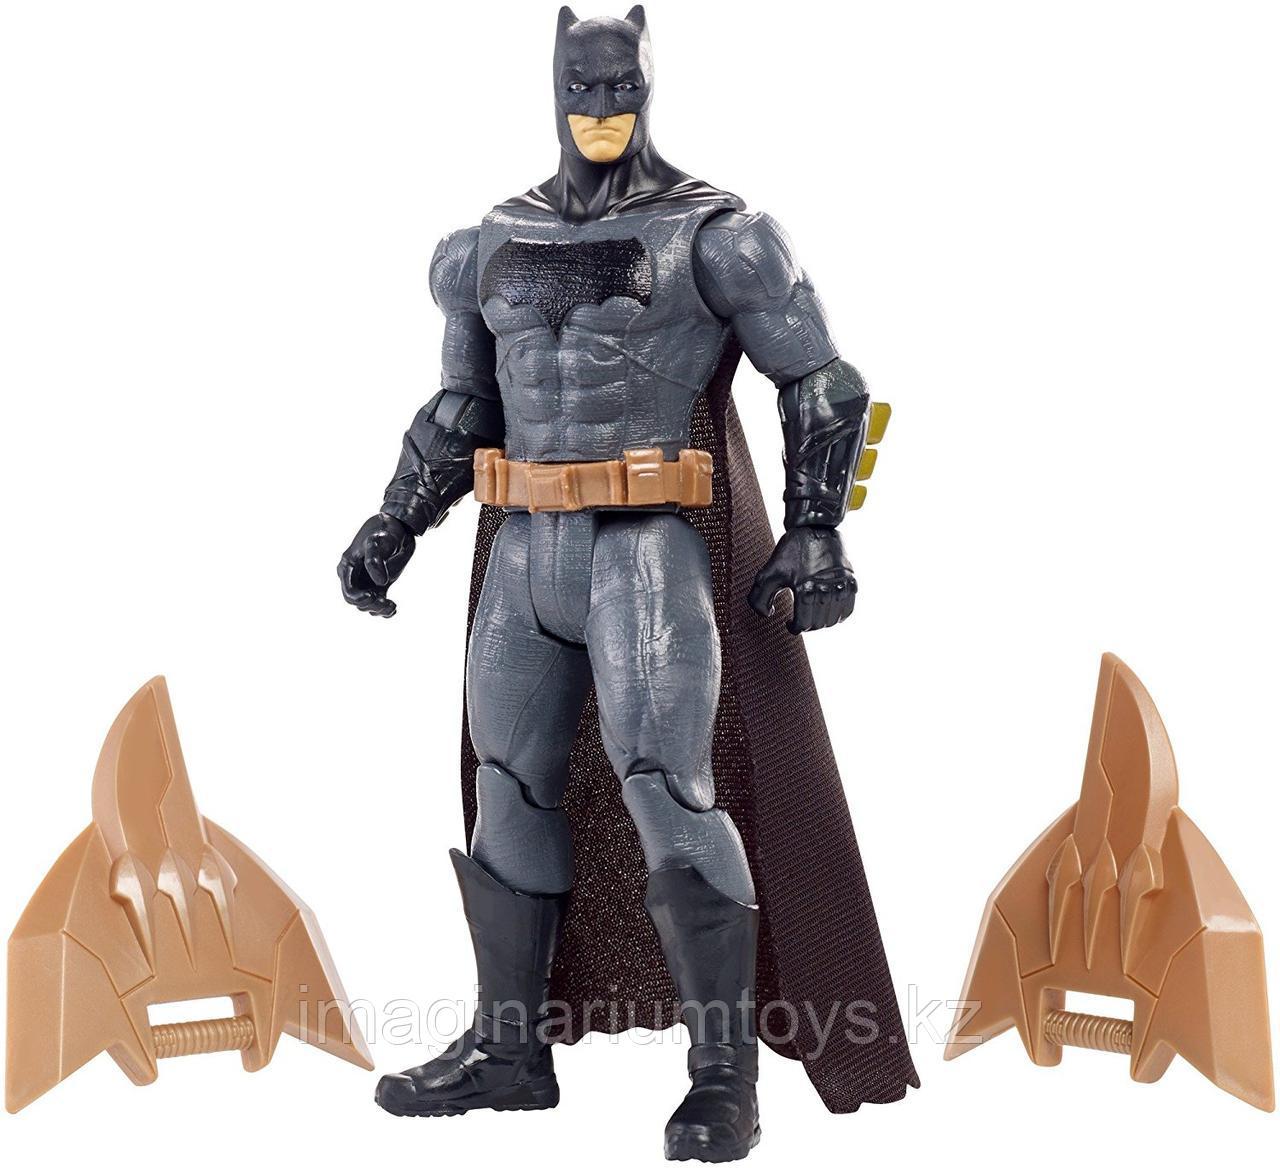 Фигурка Бэтмен 15 см